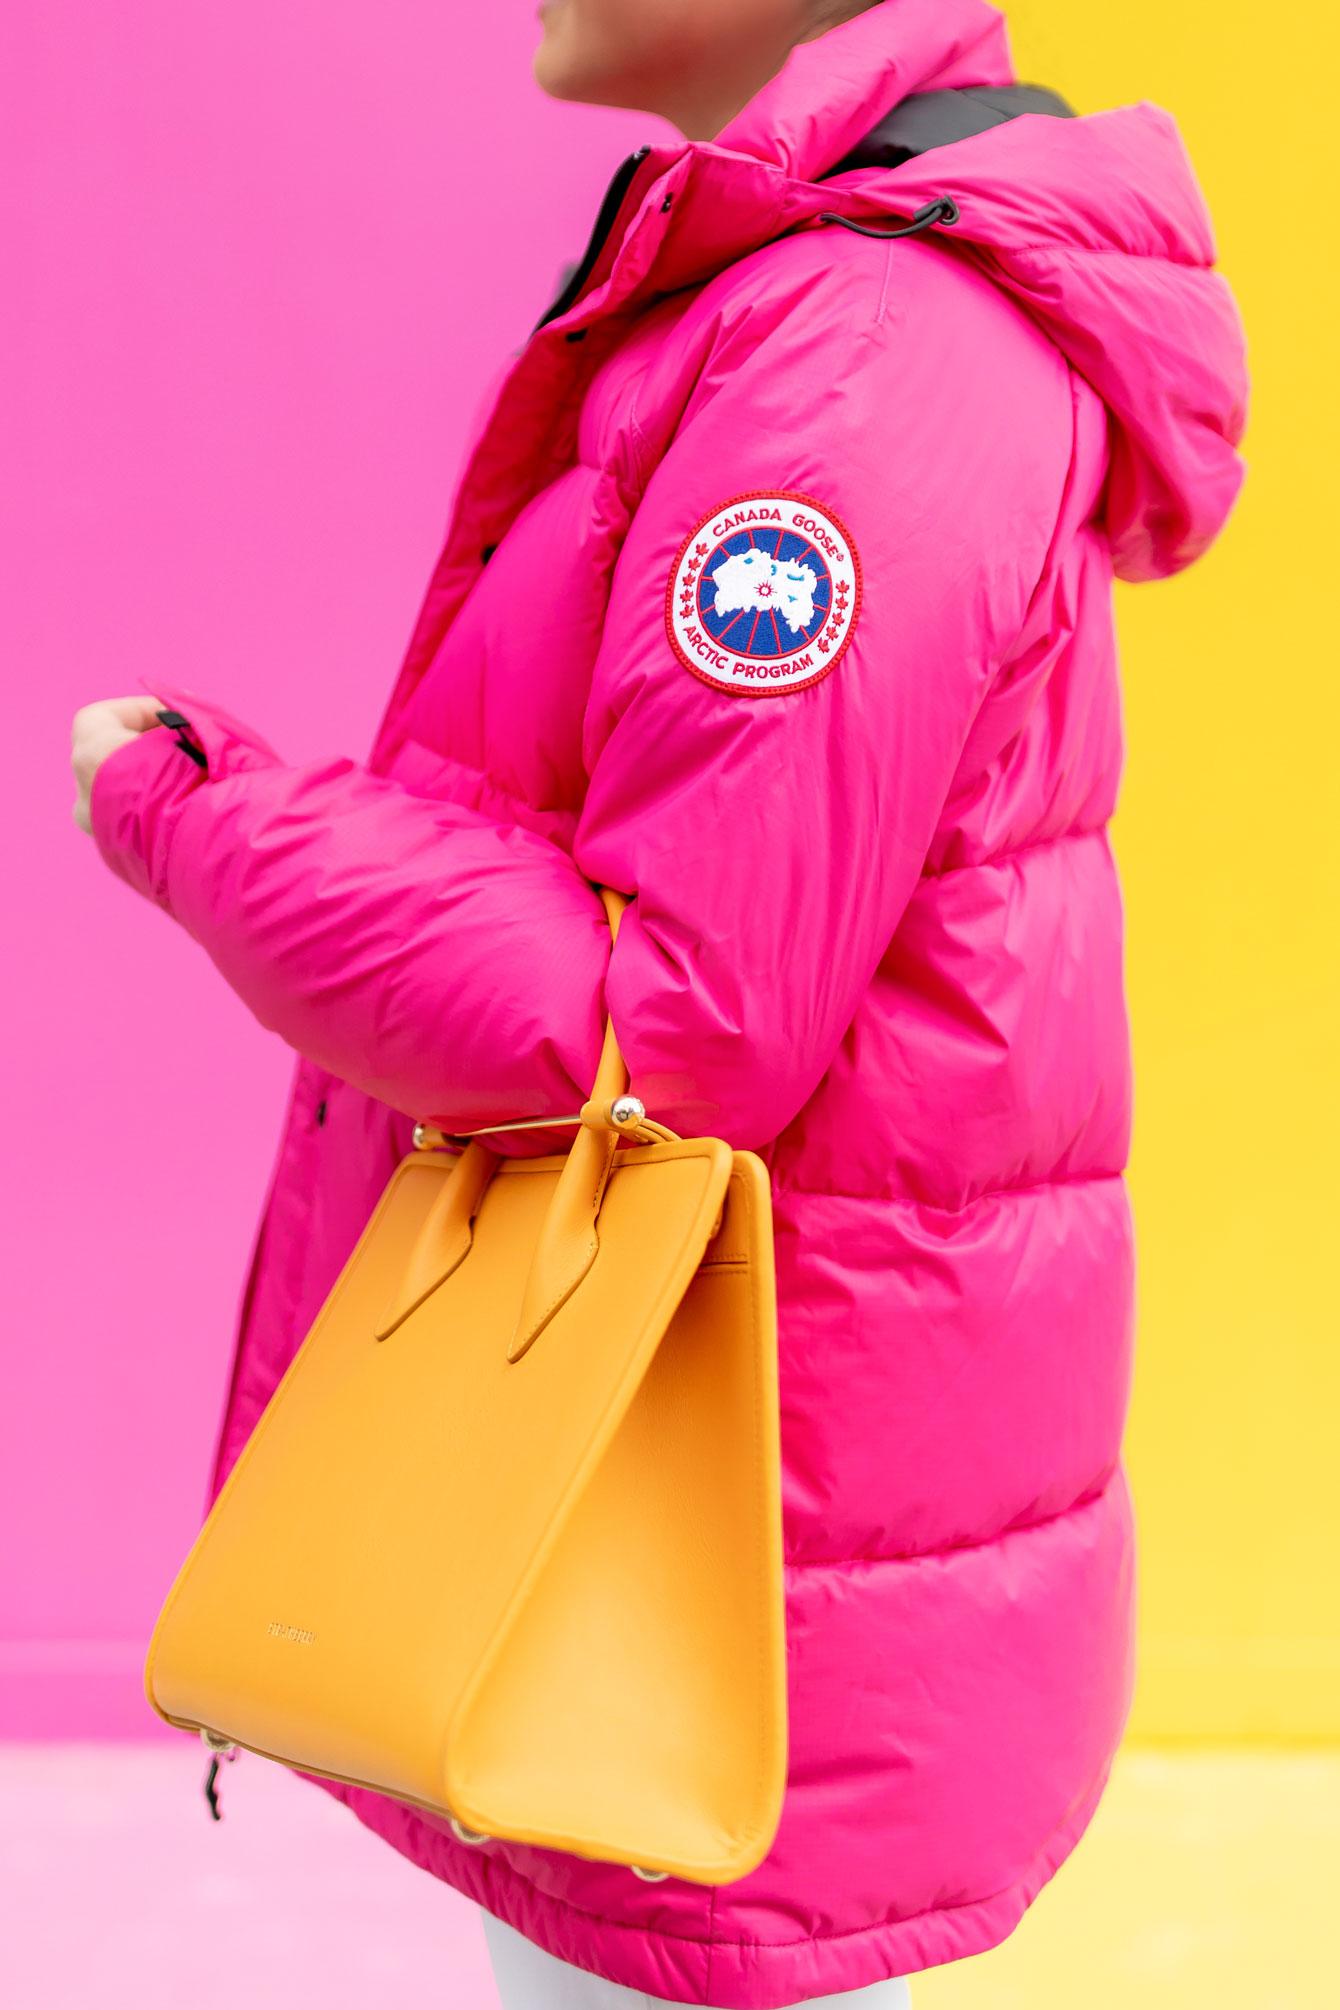 Canada Goose Pink Jacket